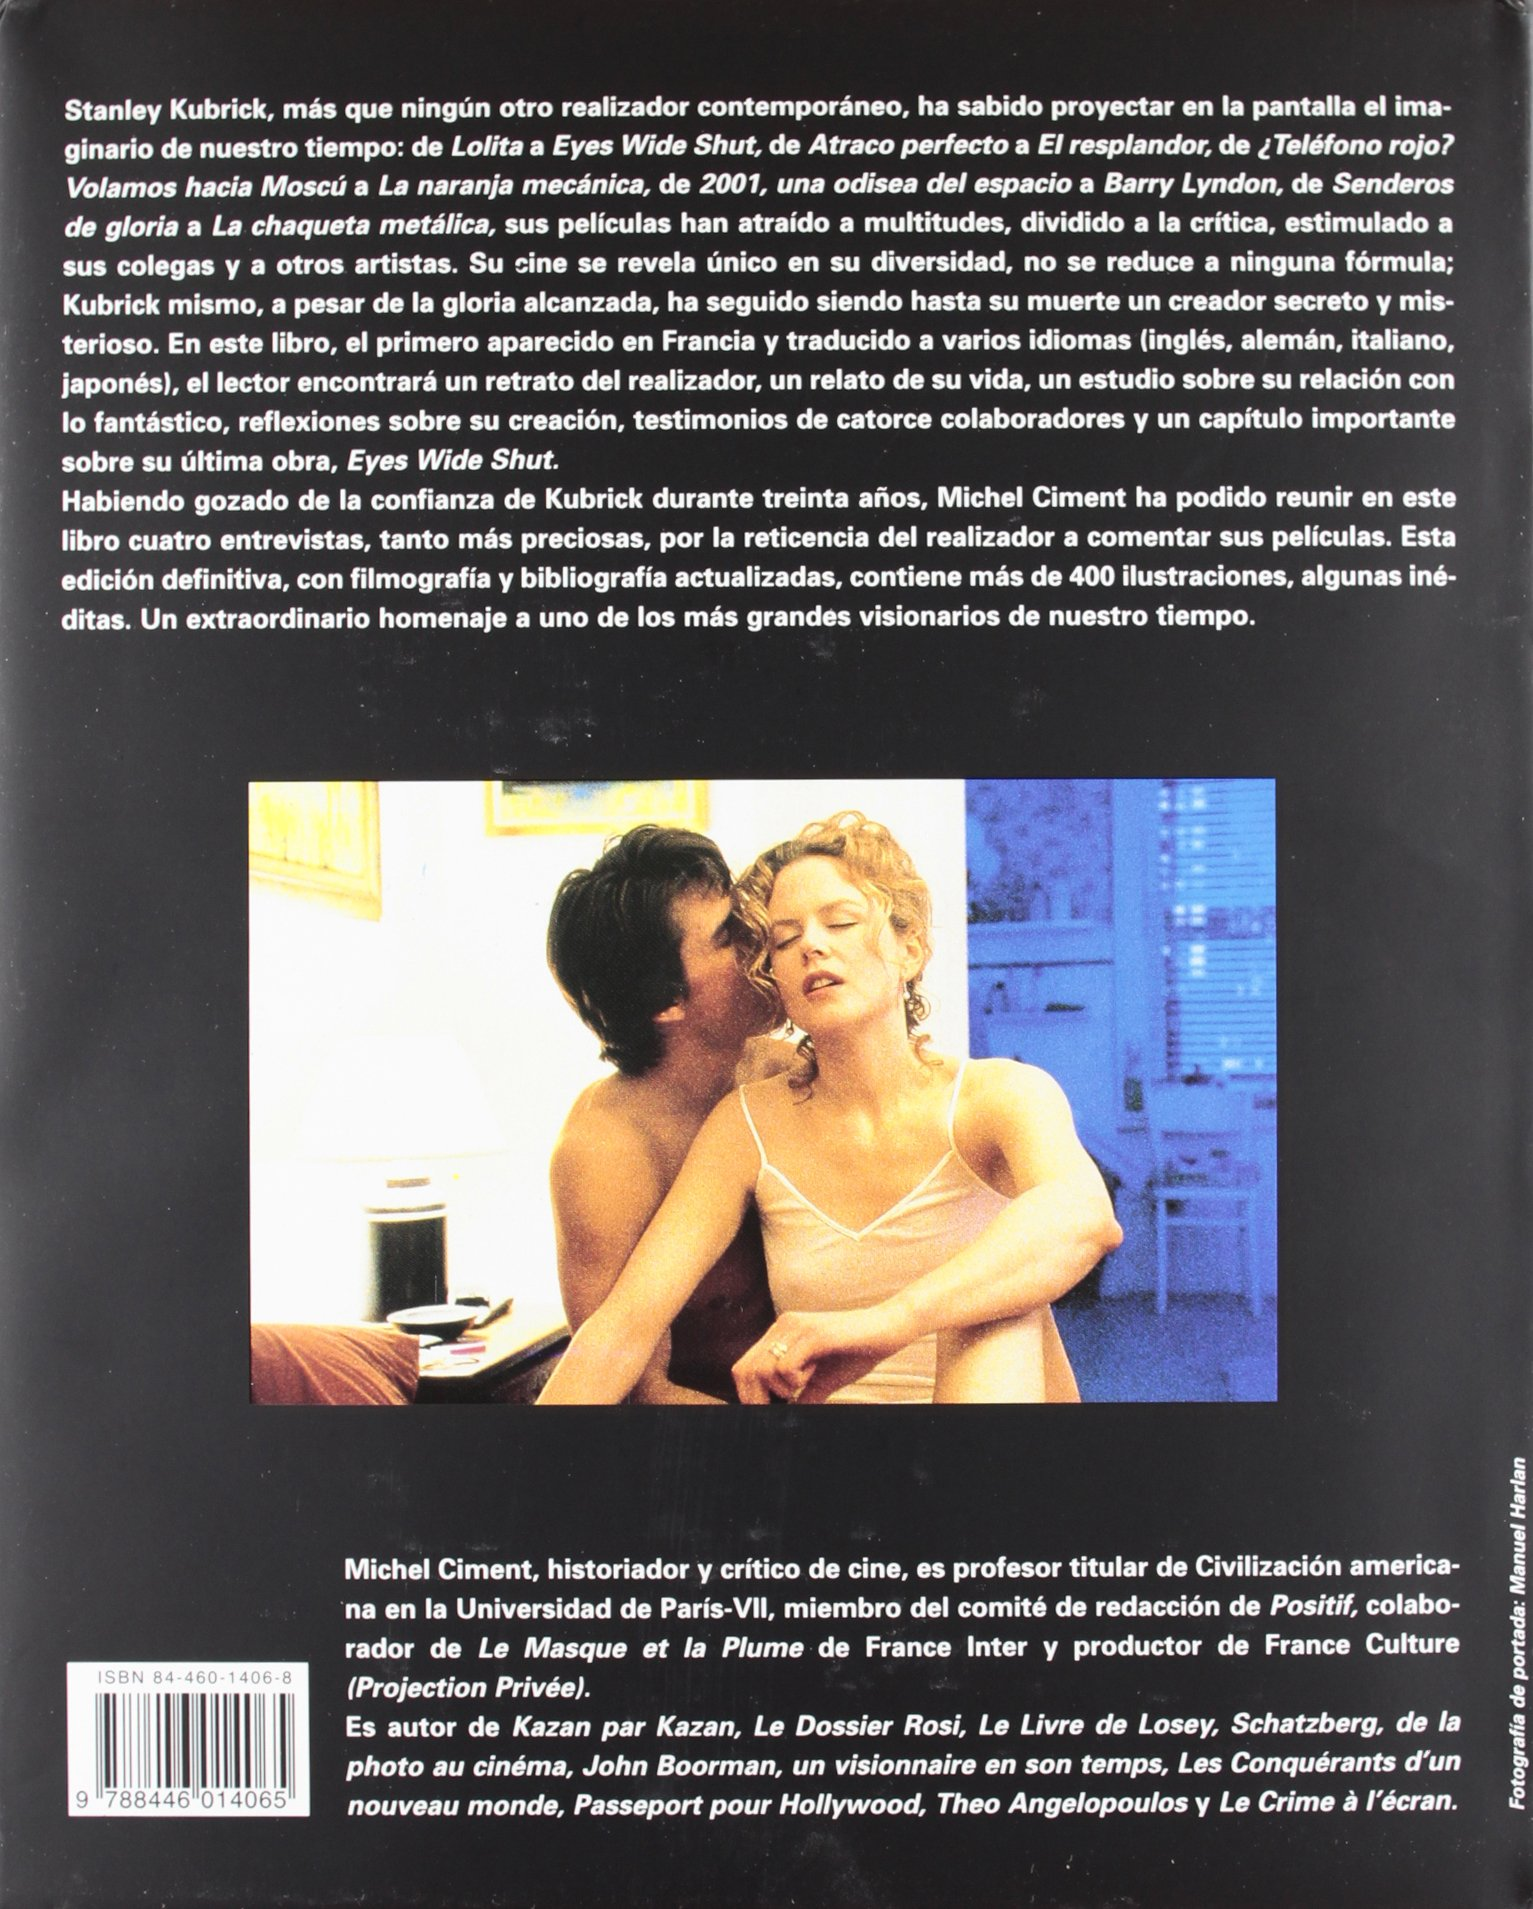 Puntua la filmografia de S Kubrick - Página 3 817EB3Okm7L